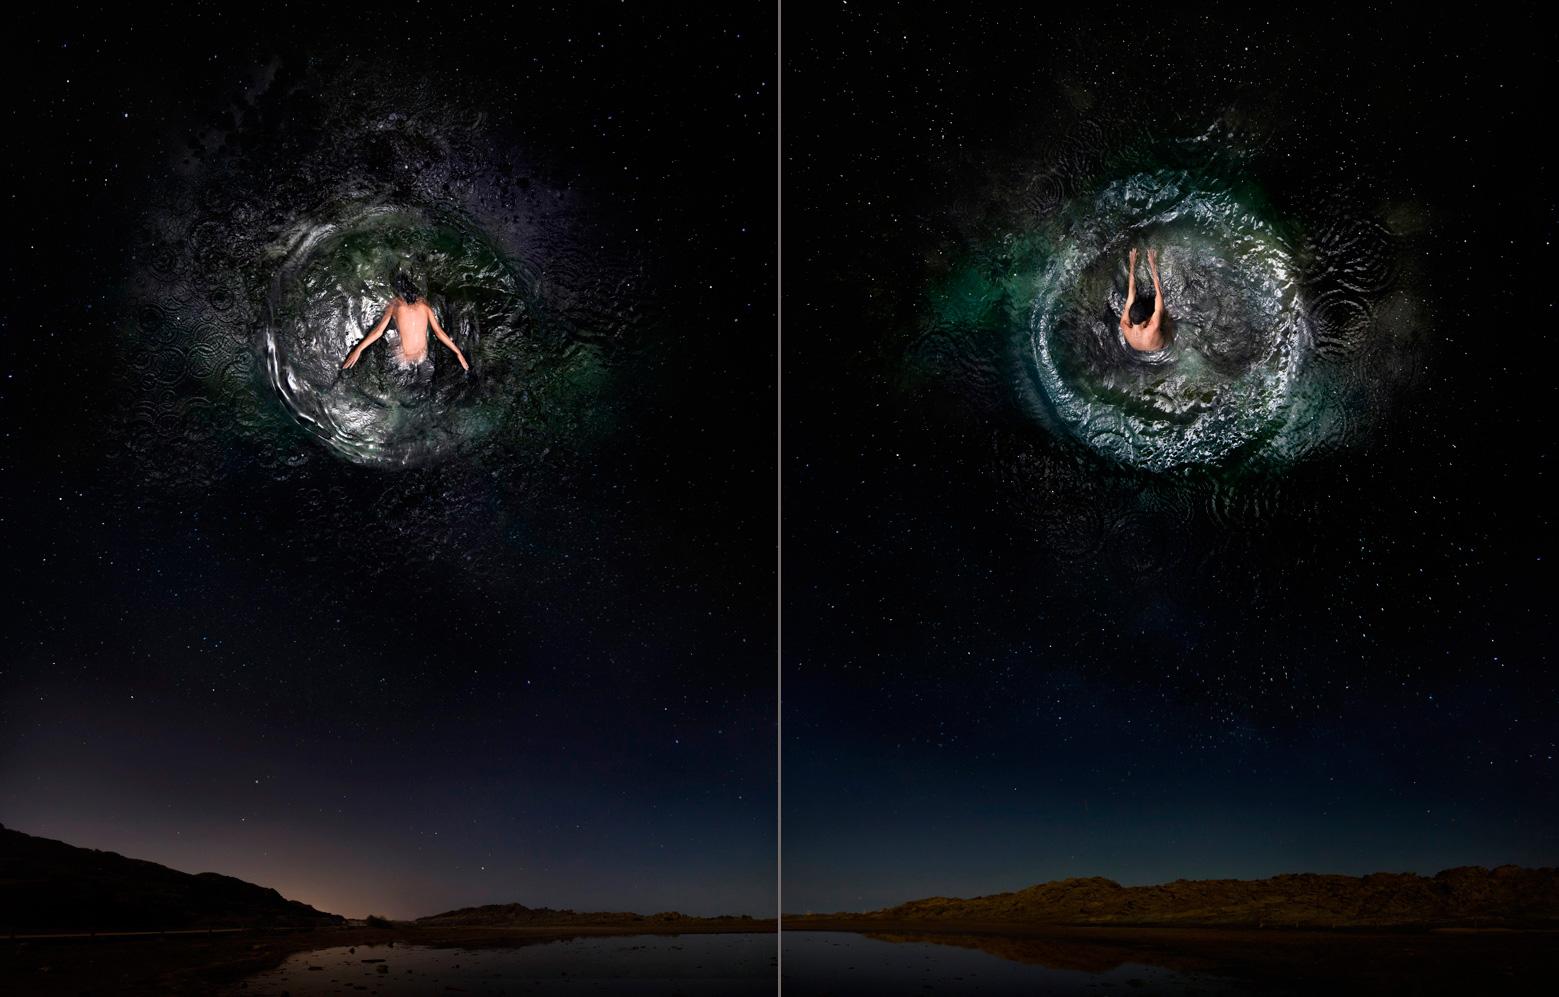 Estrella (β) librae – Zubeneschamali / Estrella (γ) librae – Zubenelakrab